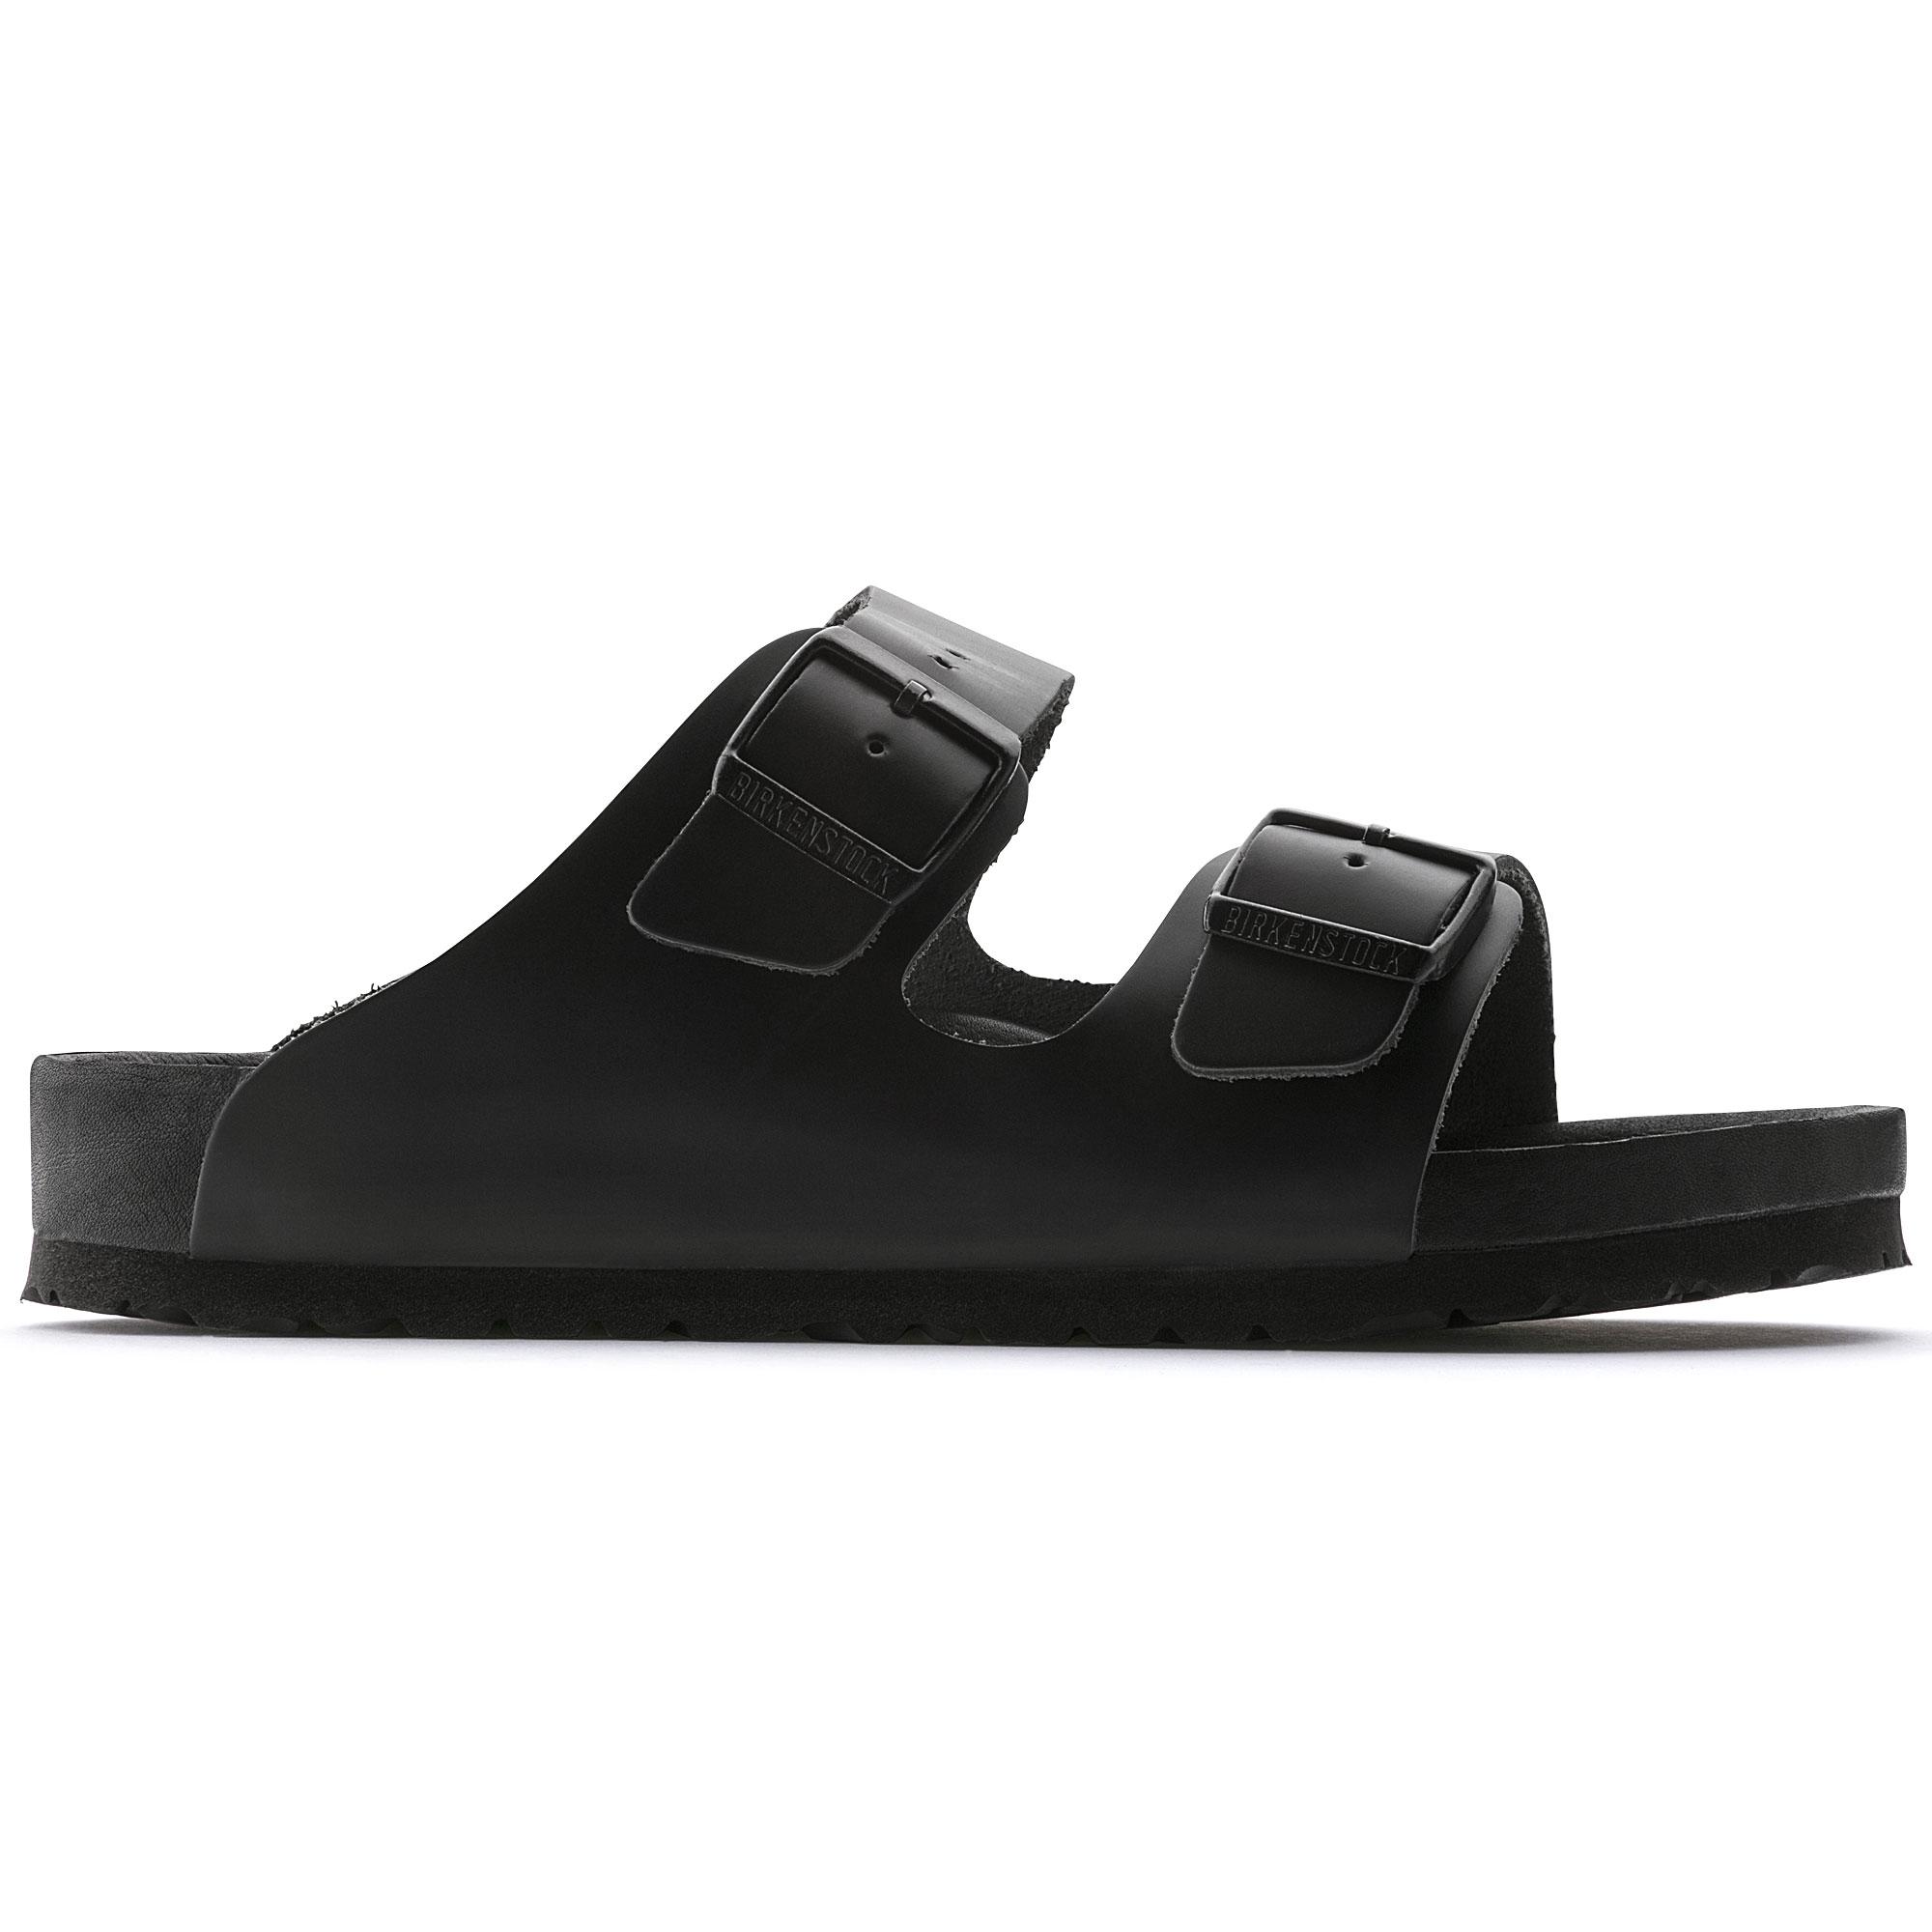 965f9f702f9c ... Monterey Natural Leather Black ...